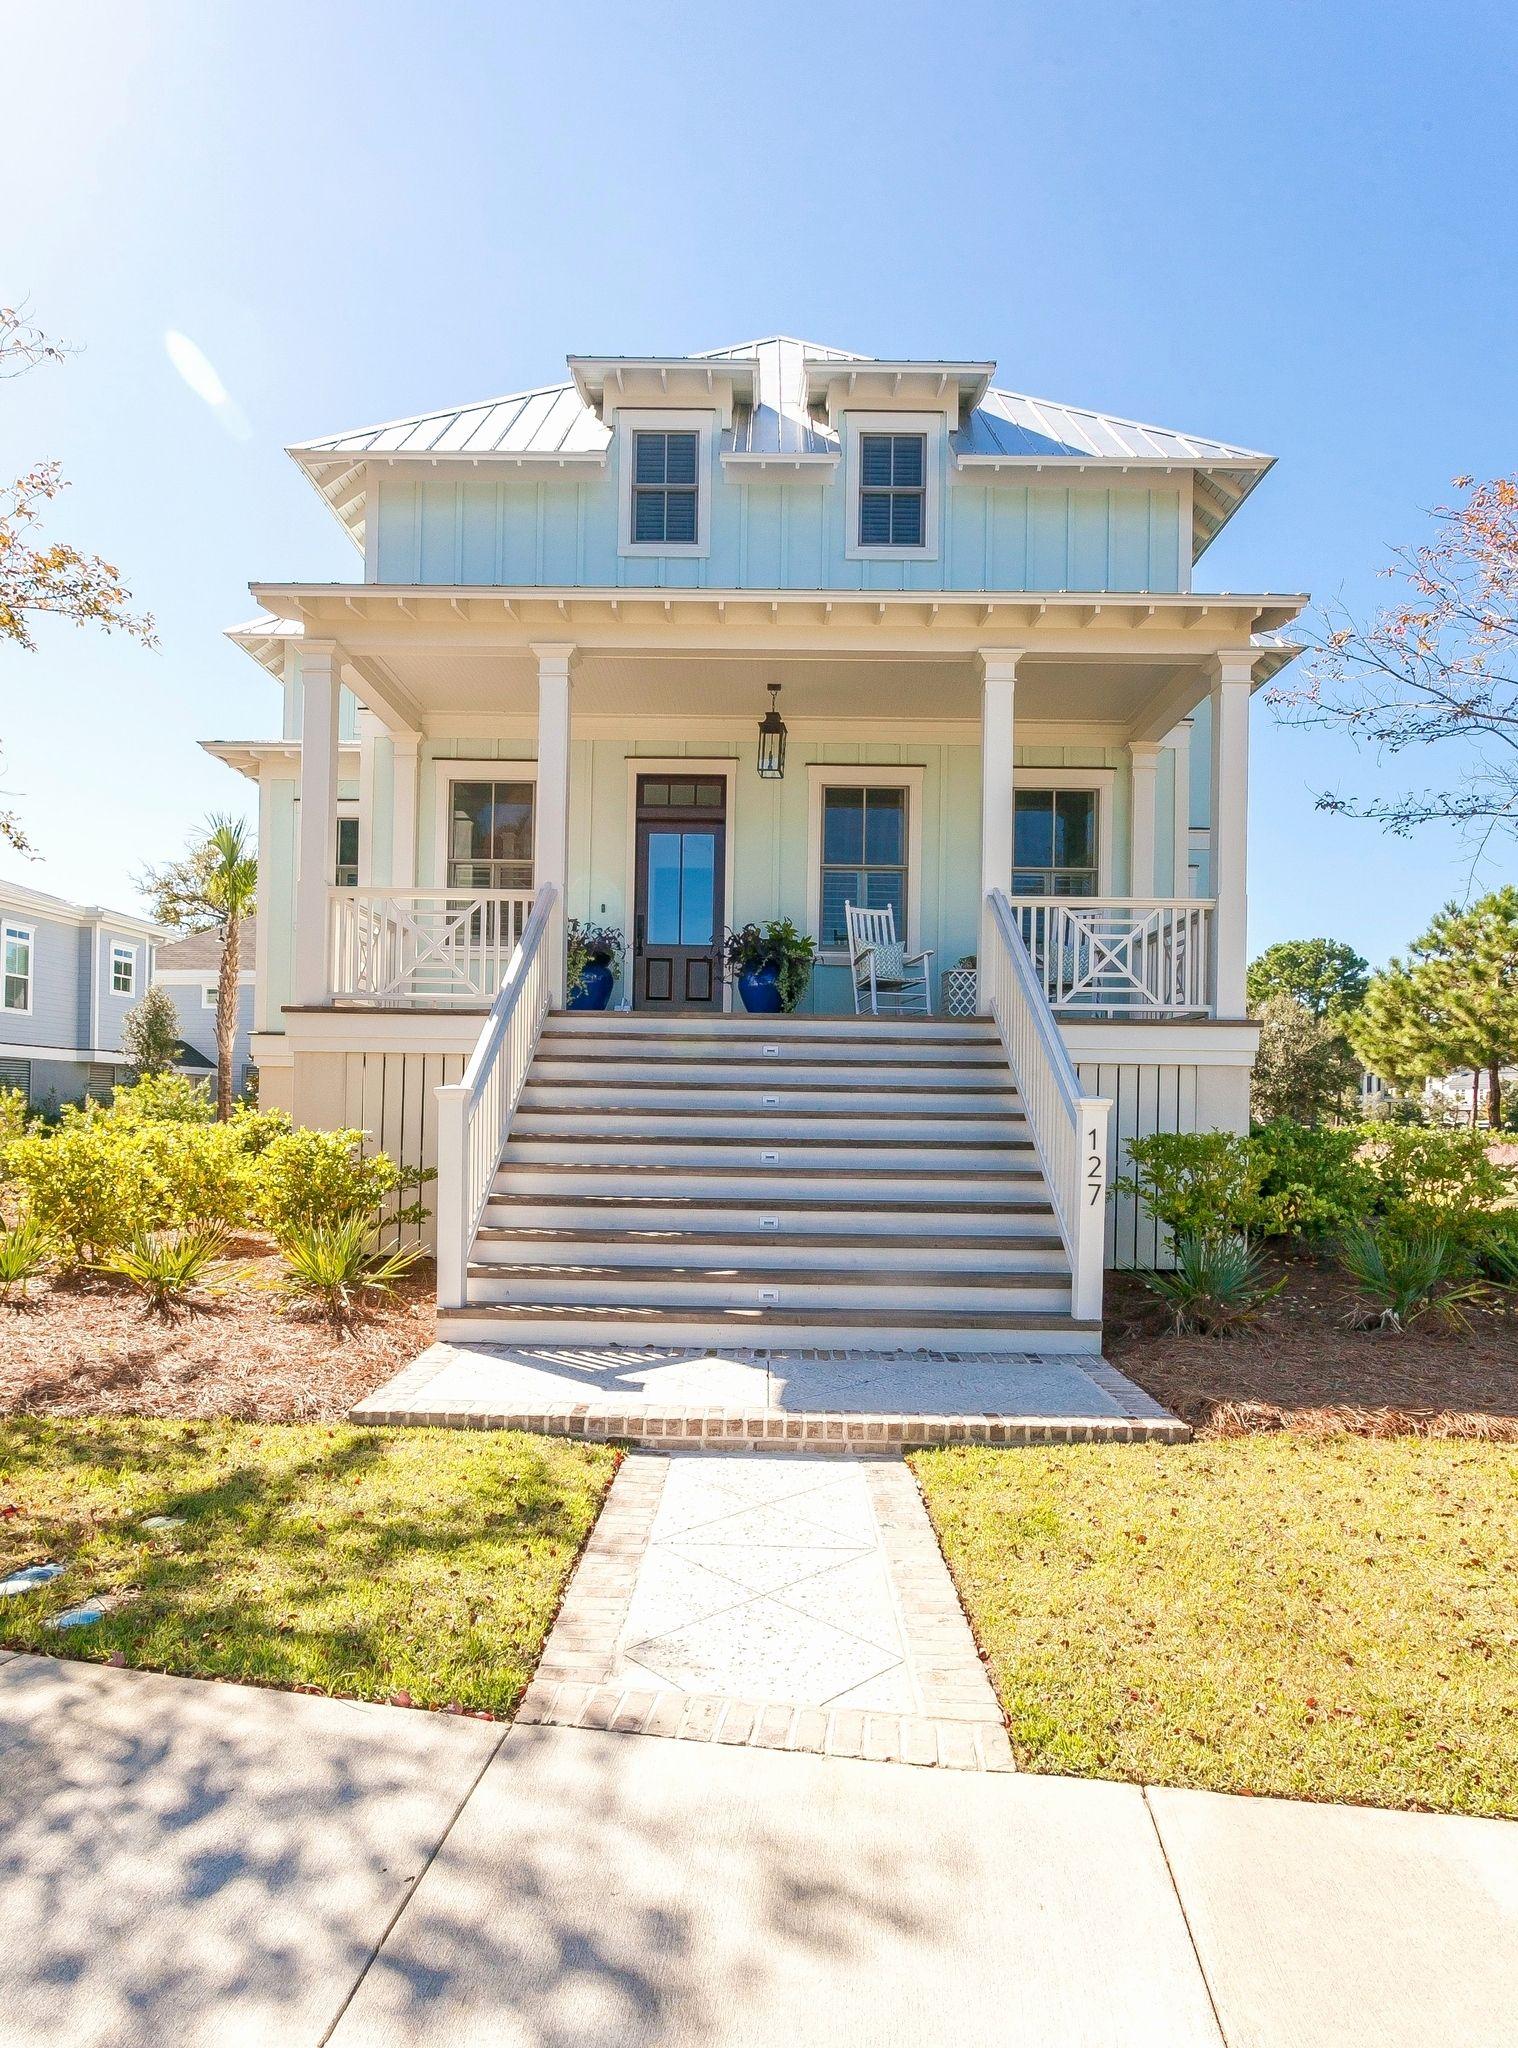 Image Result For Key West Style Stilt House Plans Cottage House Plans Coastal House Plans Narrow House Plans